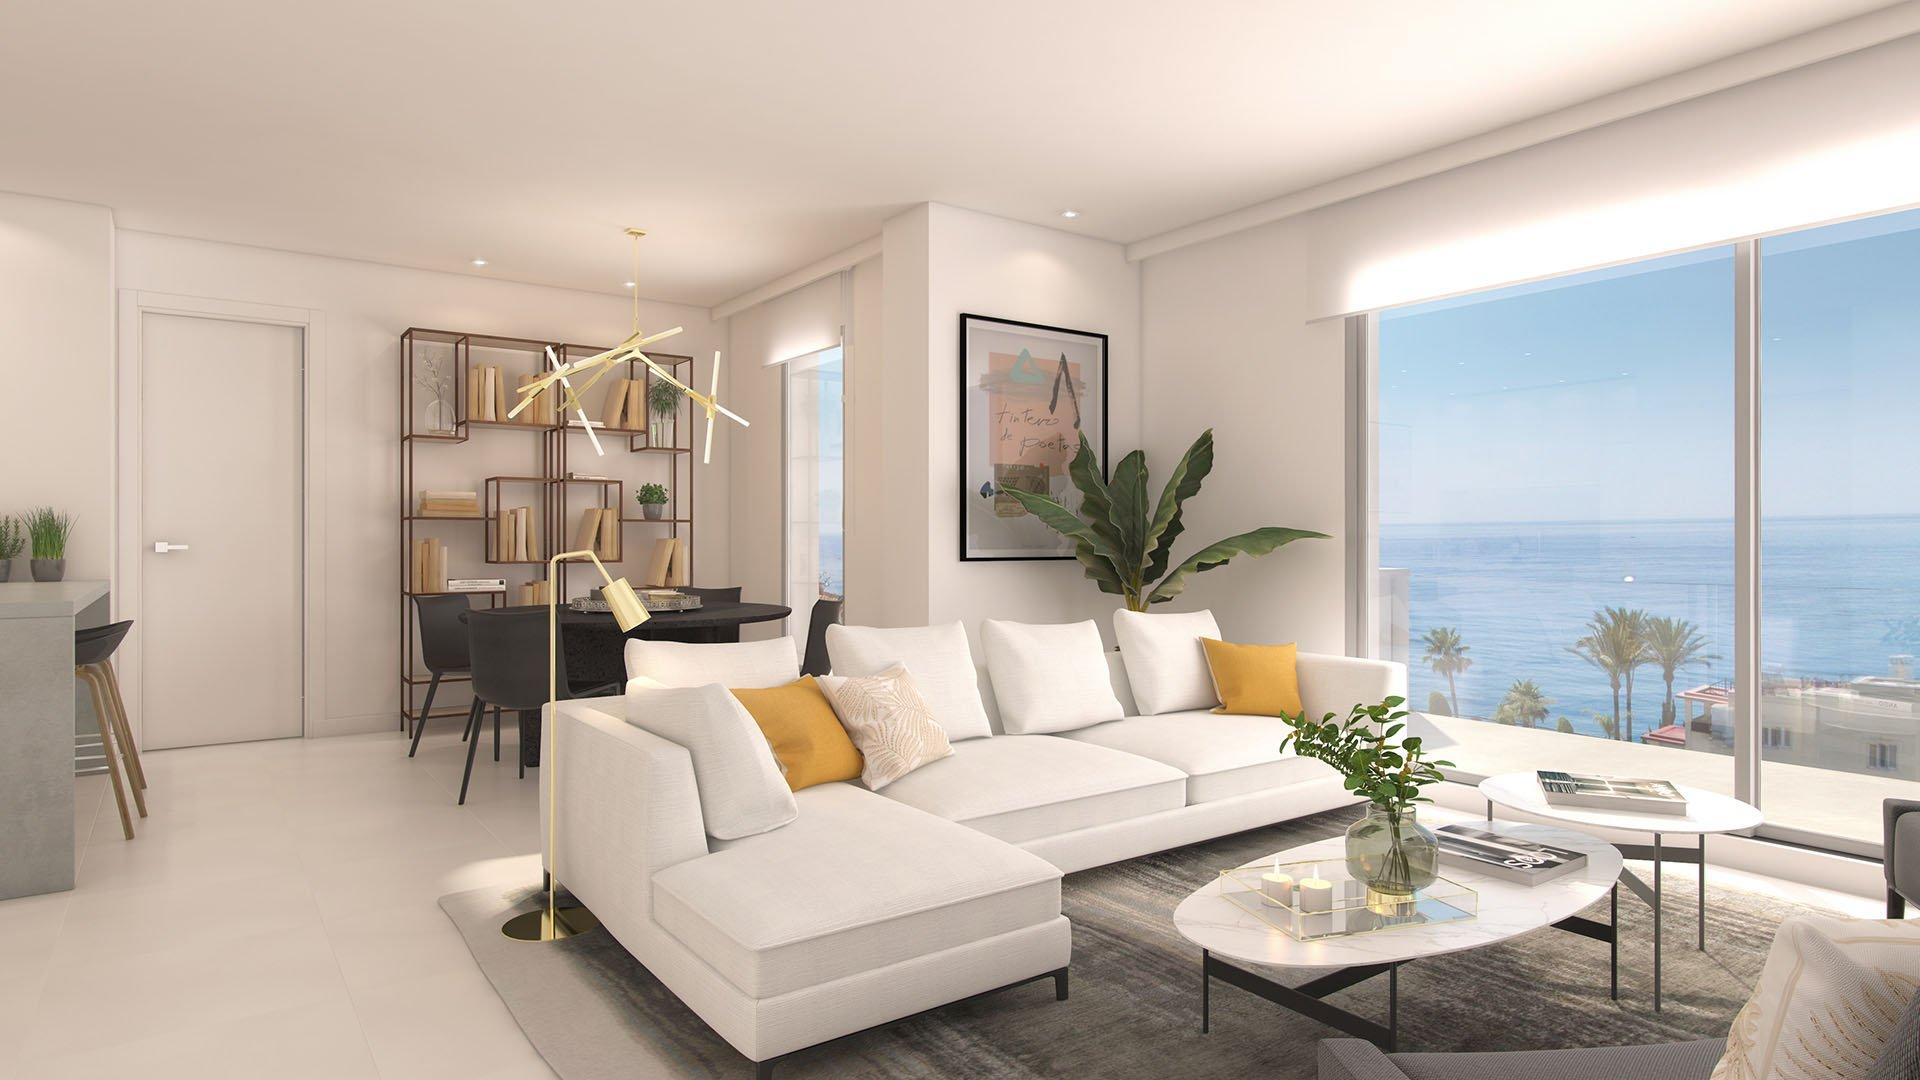 Lar Bay: Modern apartments near the beach with amazing views